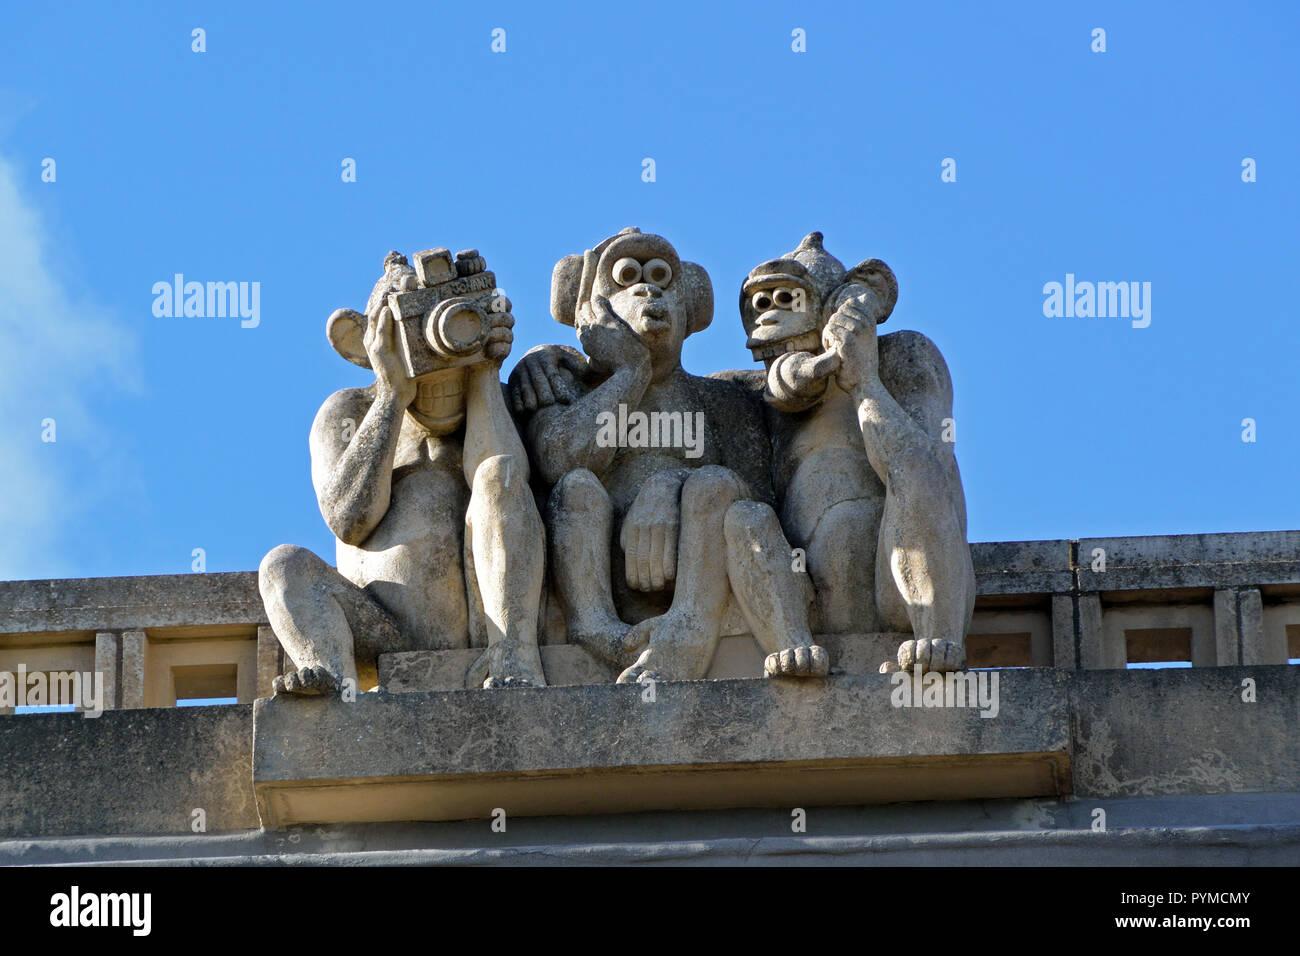 Three Wise Monkeys sculpture on the roof of Waterloo Park Pavilion, Norwich, Norfolk, UK Stock Photo